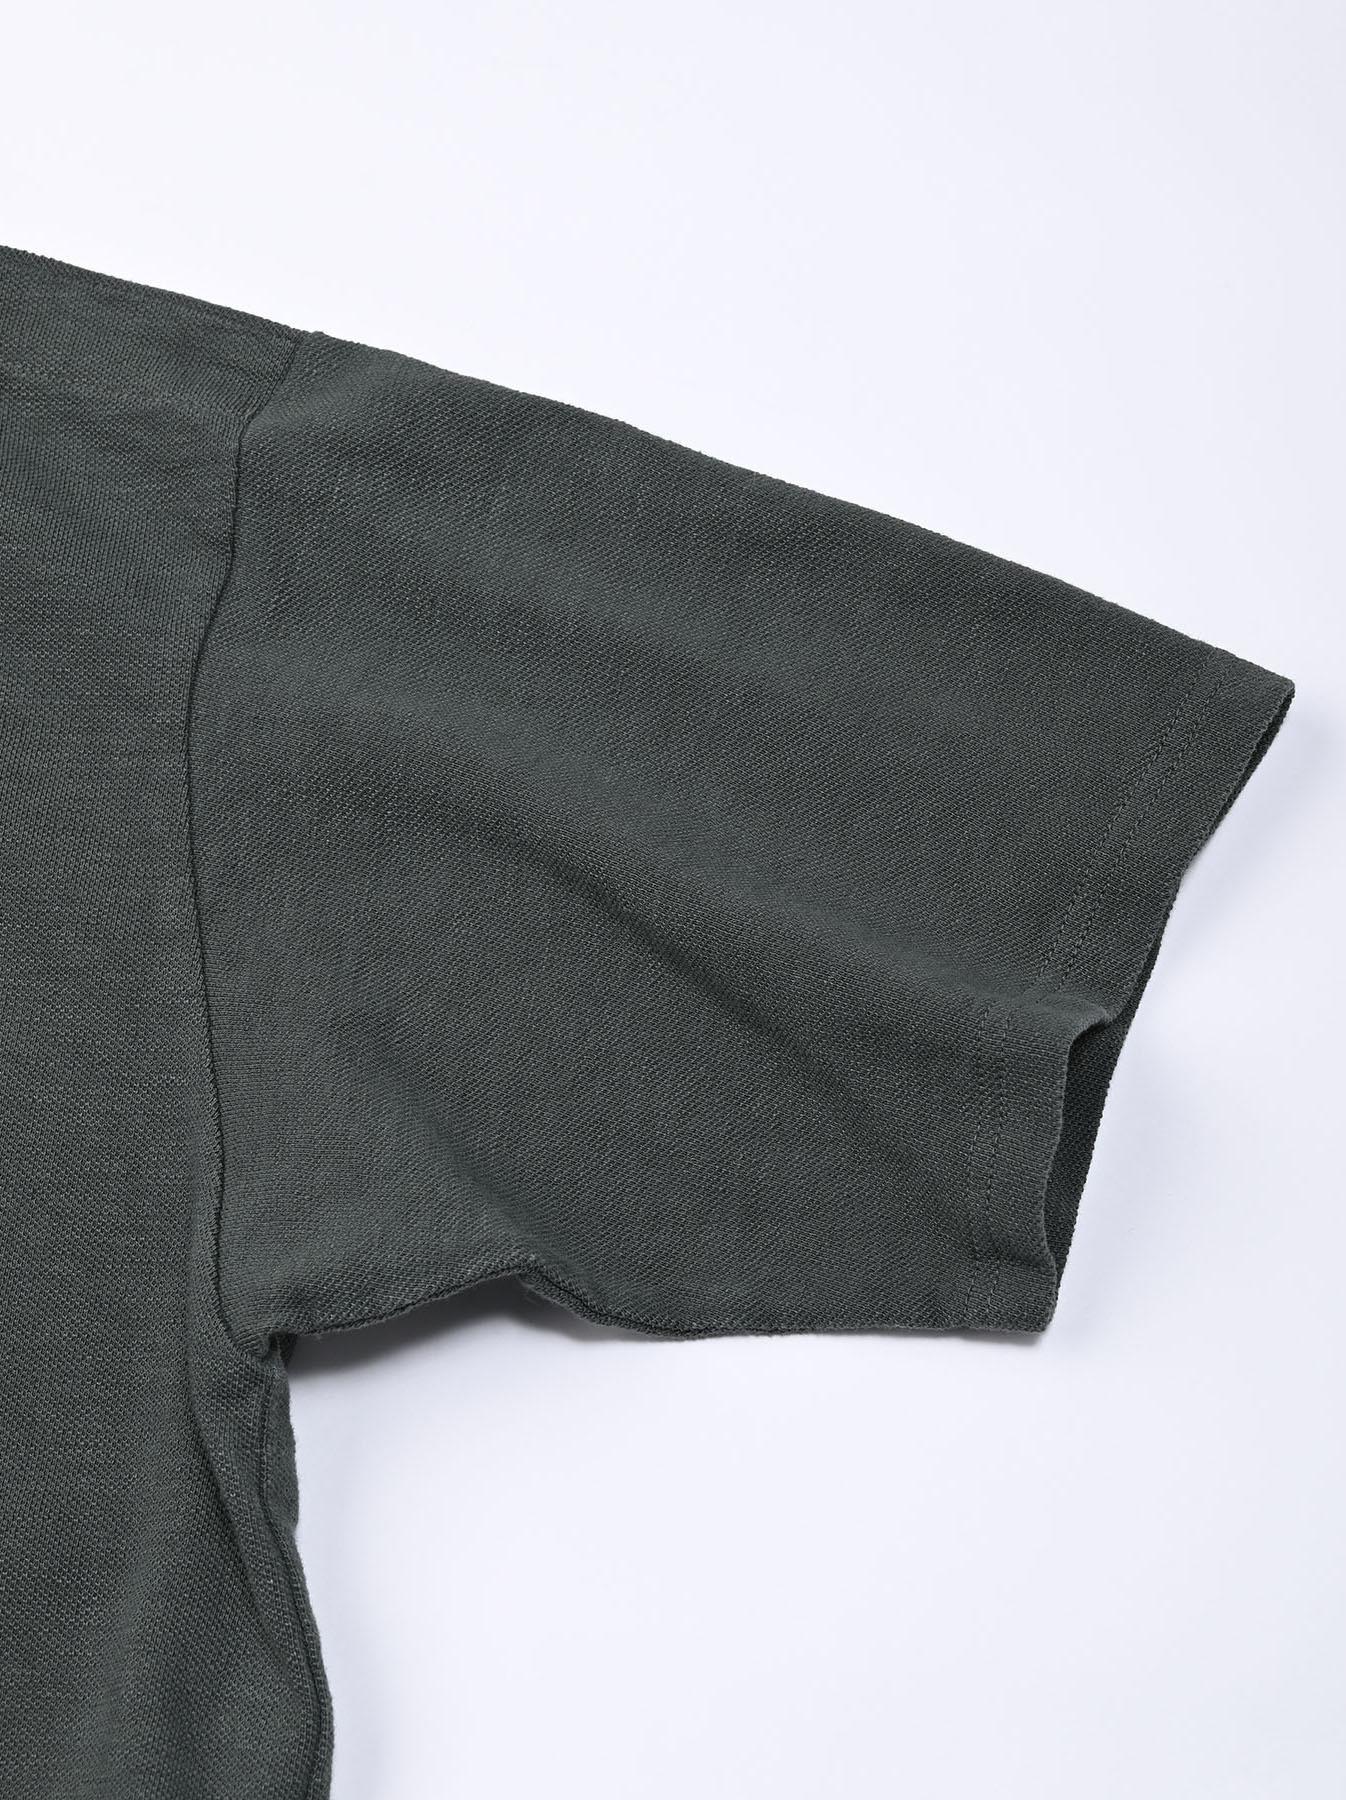 Kanoko Ocean Shiokaze Short-sleeved Polo Dress (0521)-10